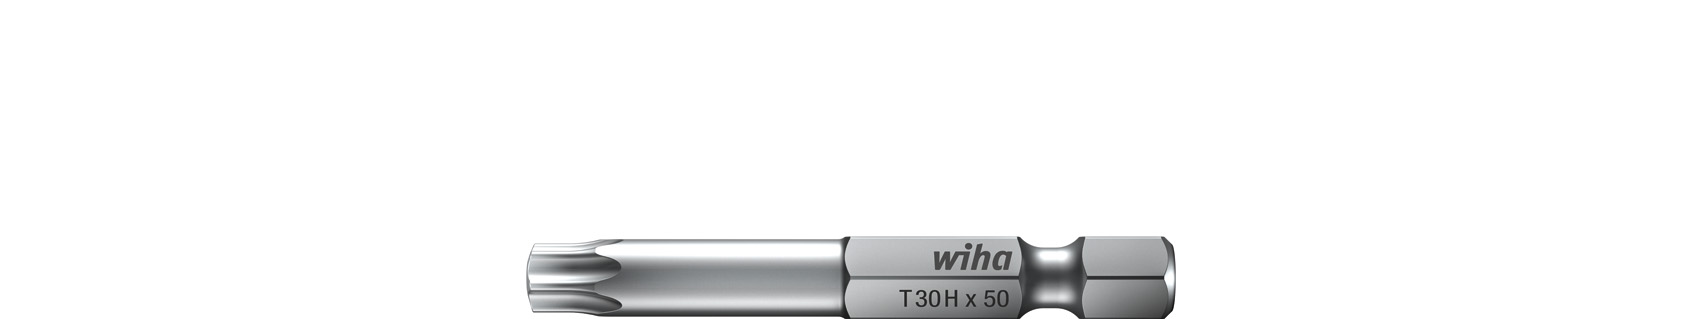 39190 Wiha Bit Professional TORX/® Tamper Resistant 1//4 T20H x 90 mm mit Bohrung